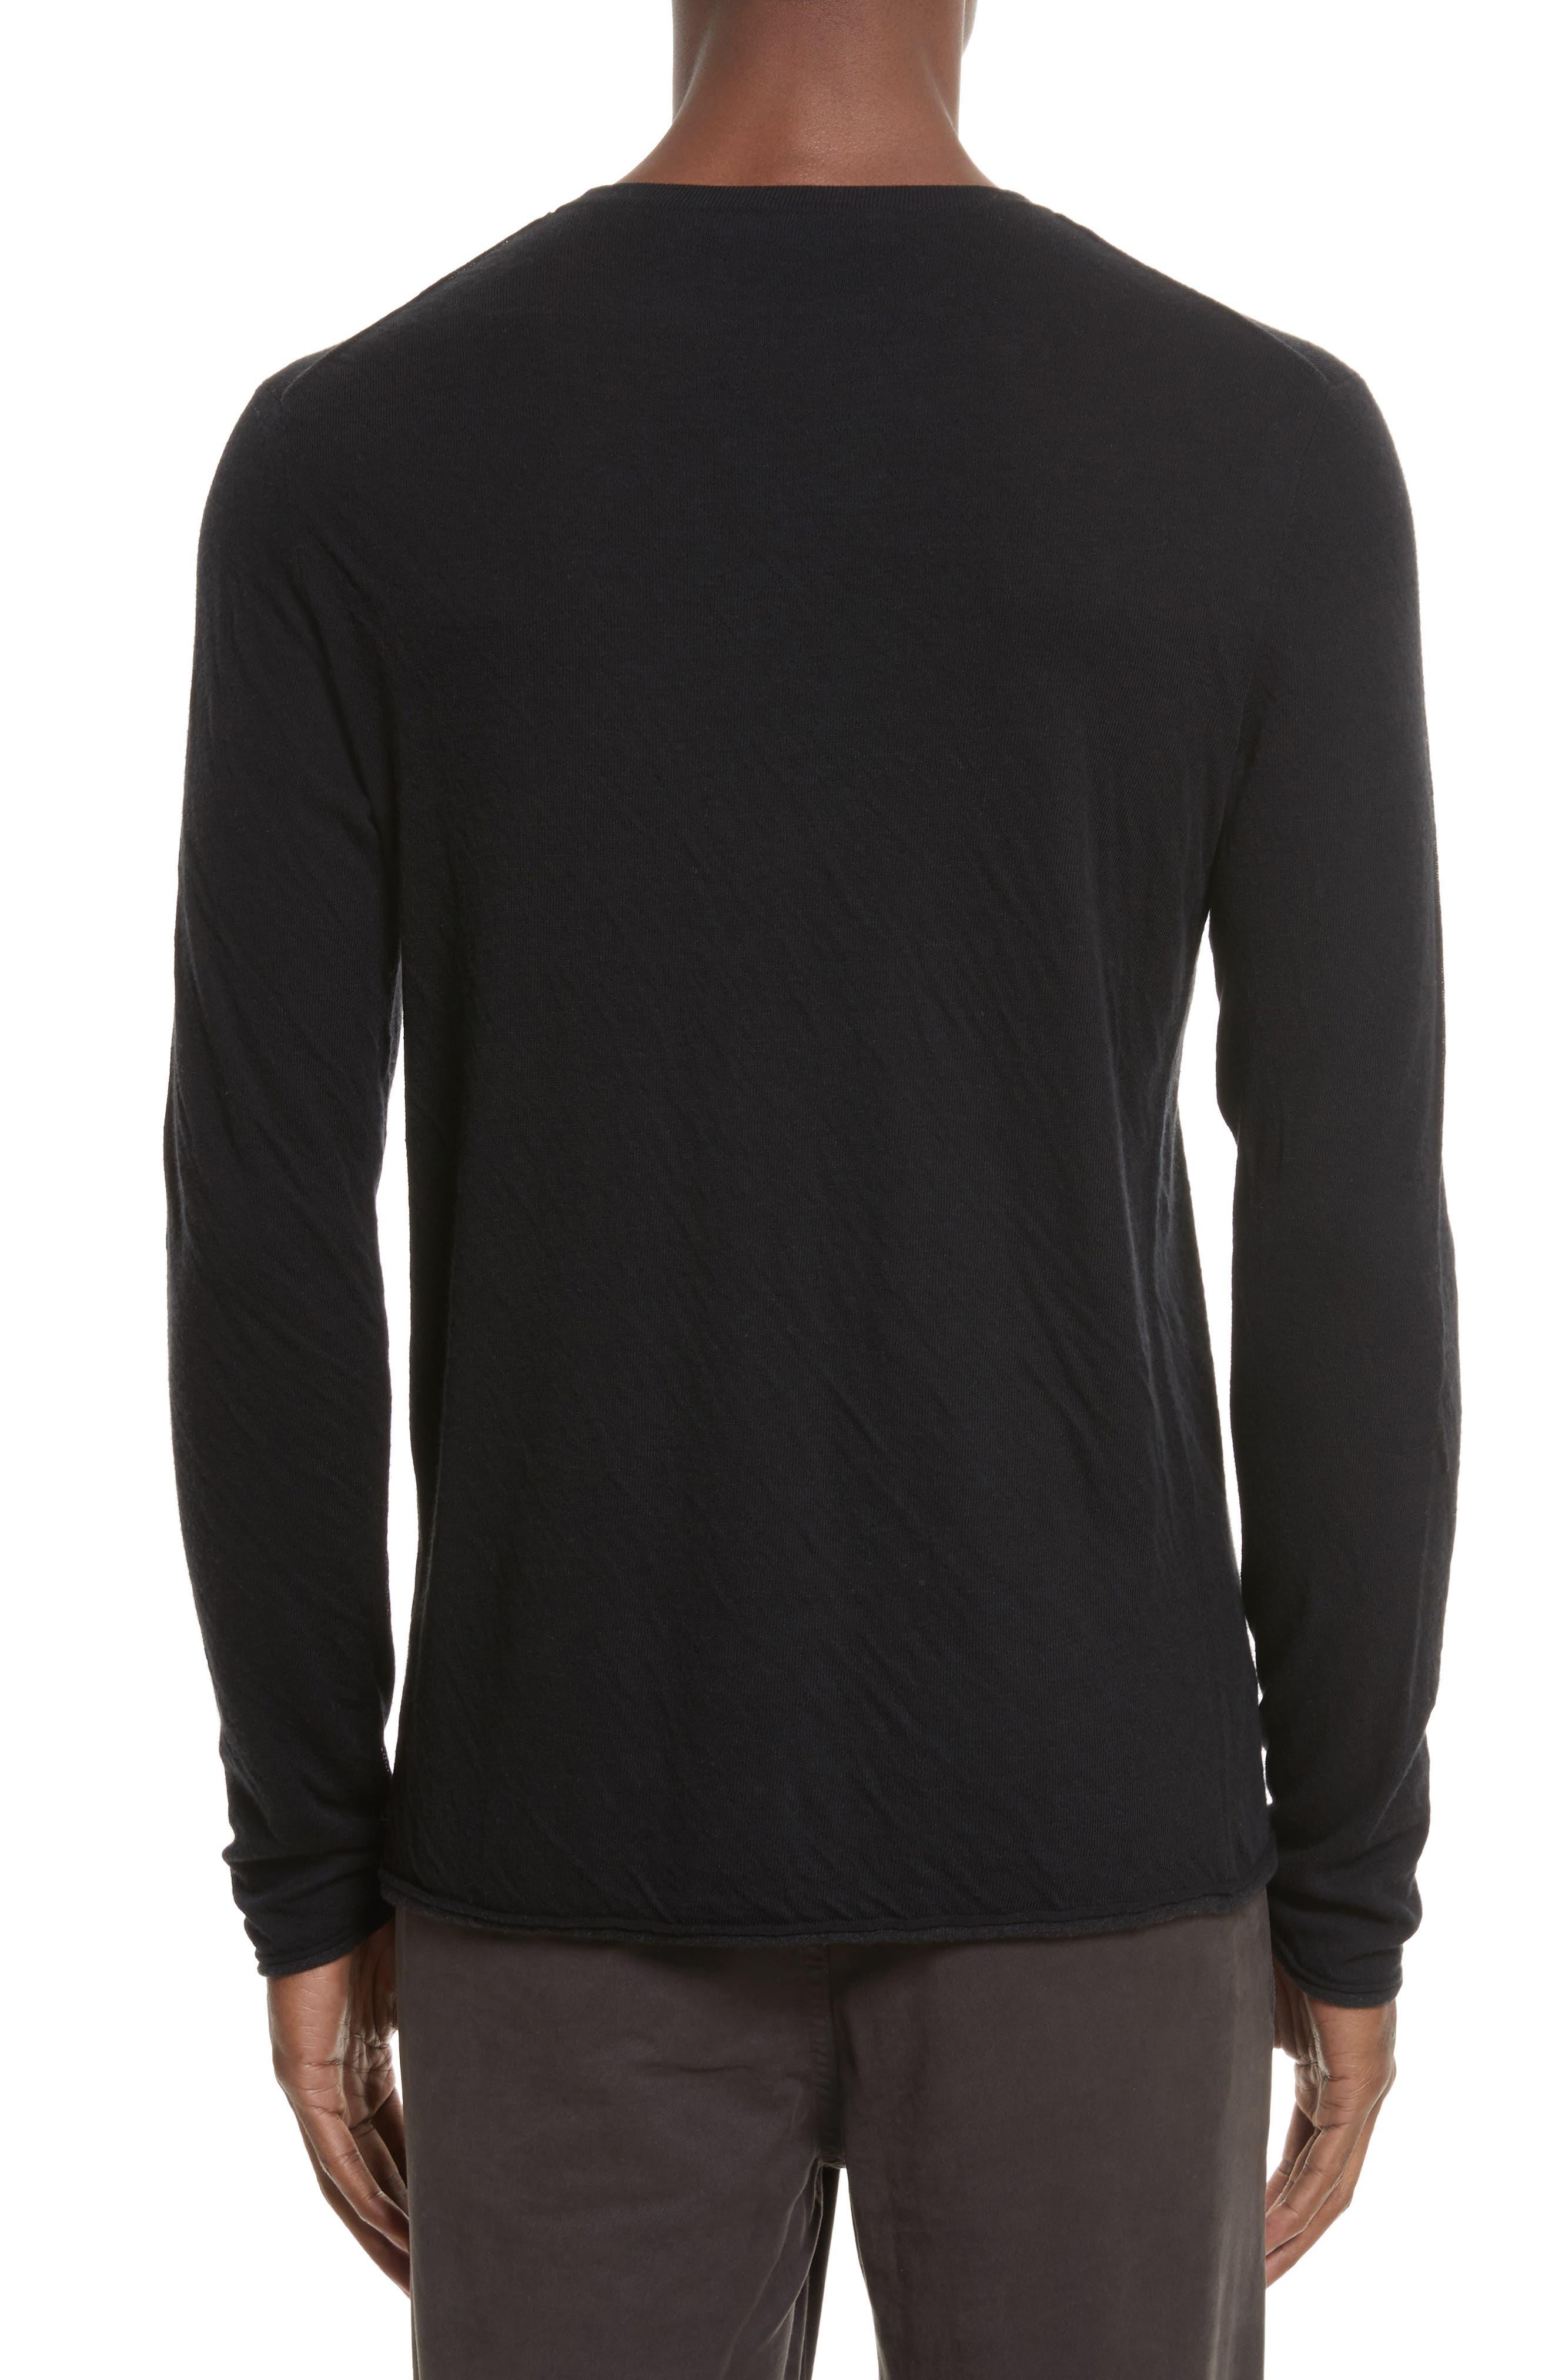 Tripp Crewneck Sweater,                             Alternate thumbnail 2, color,                             001